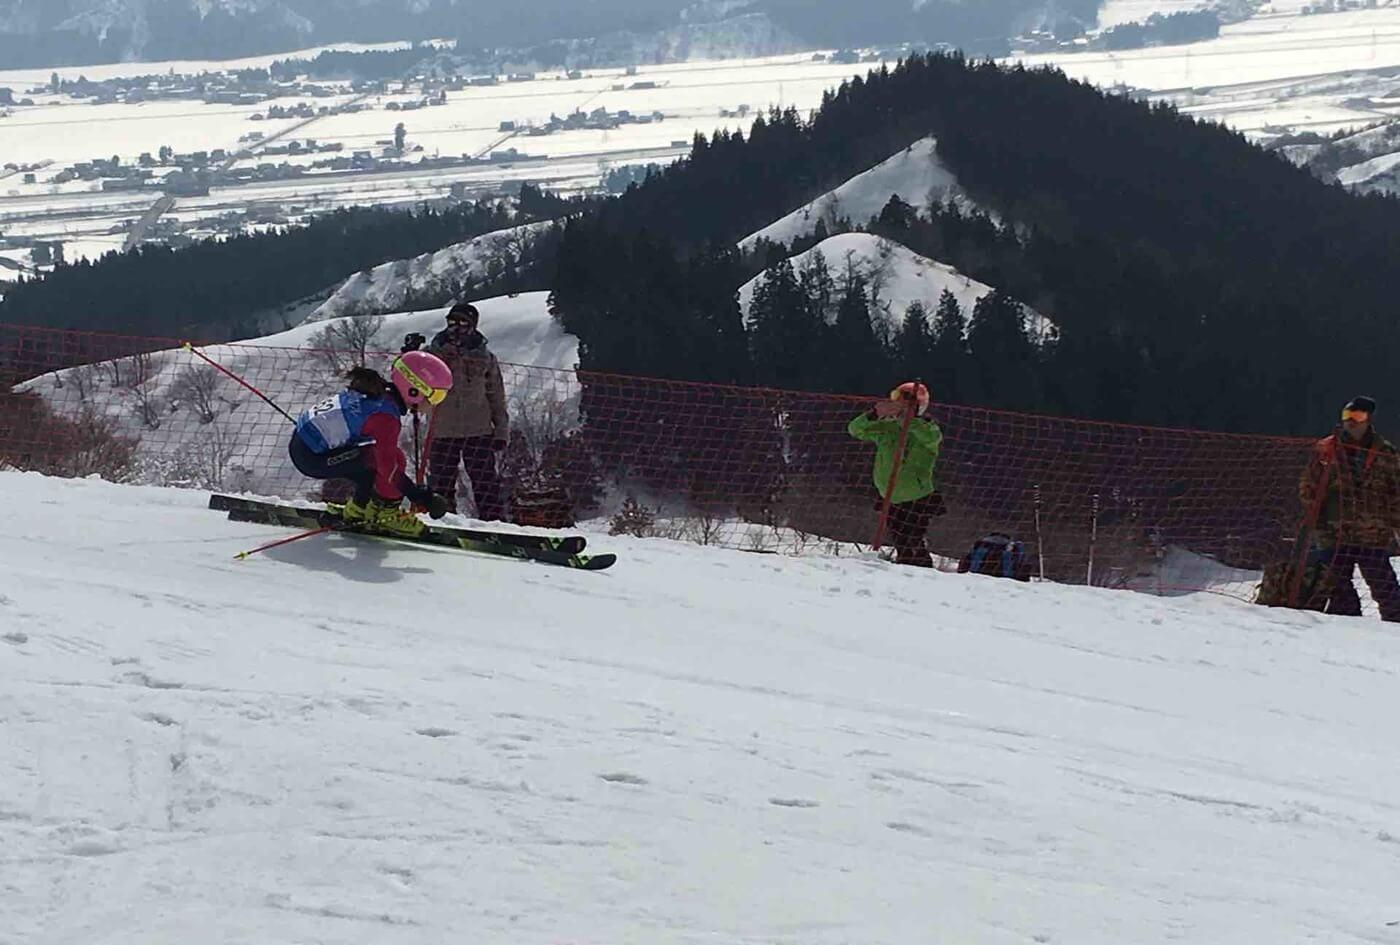 関東ユースシリーズ第2戦東京大会   長野県(野沢温泉スキー場)